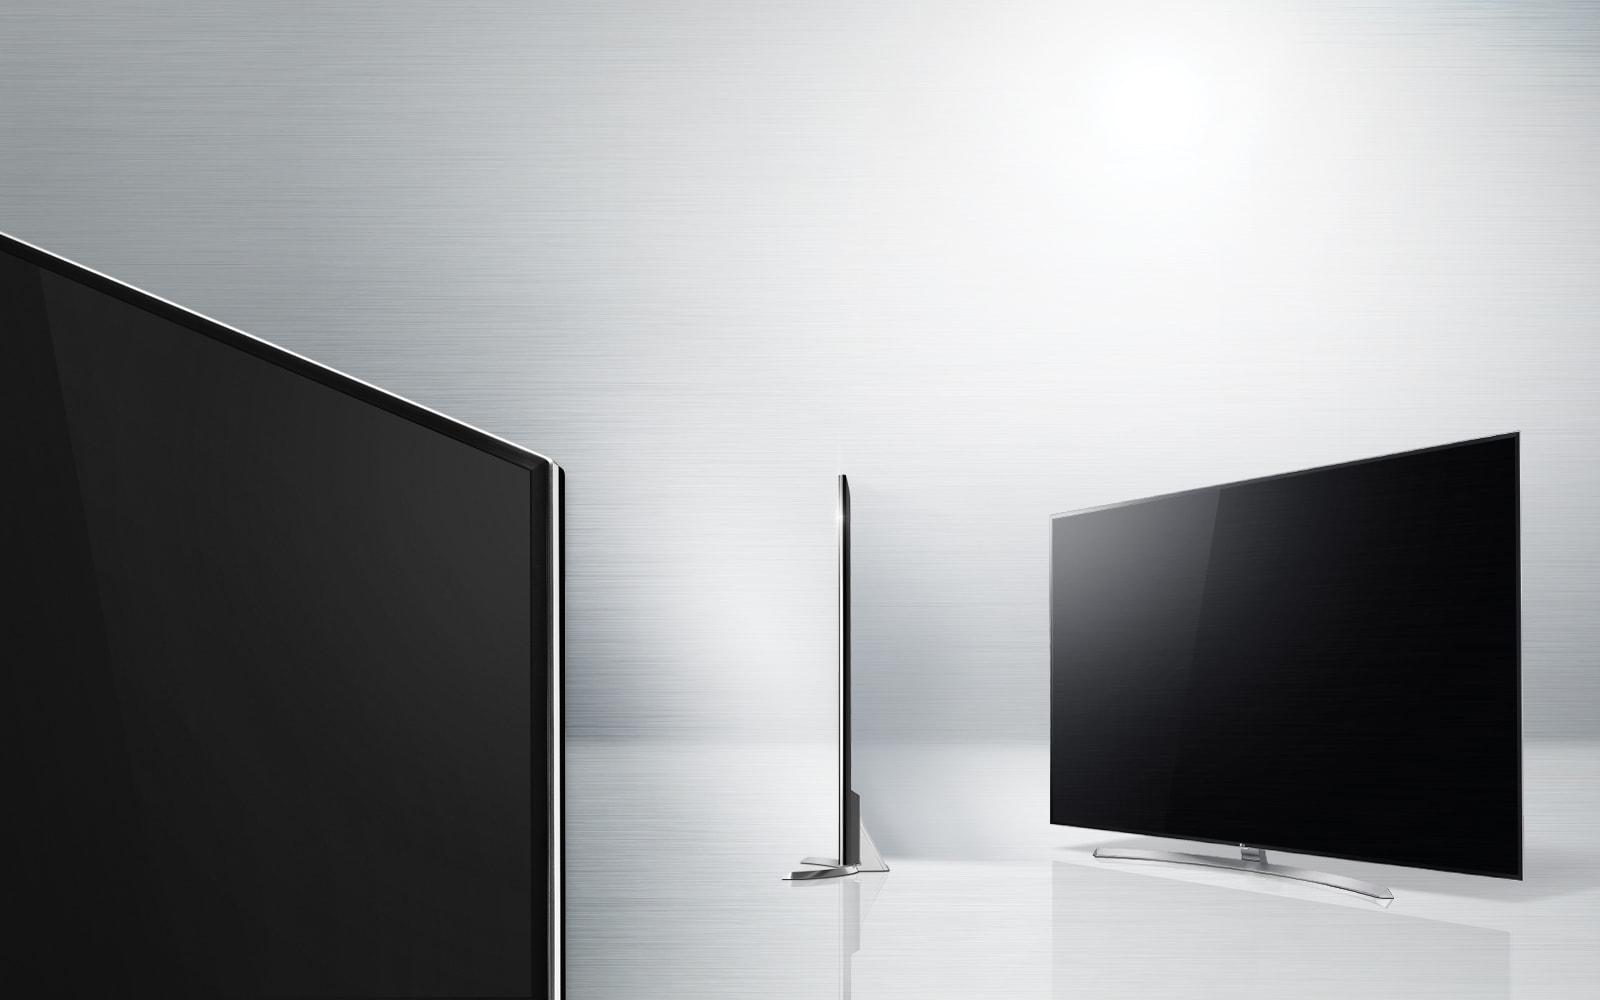 Super Design ทีวีดีไซน์ล้ำสมัย